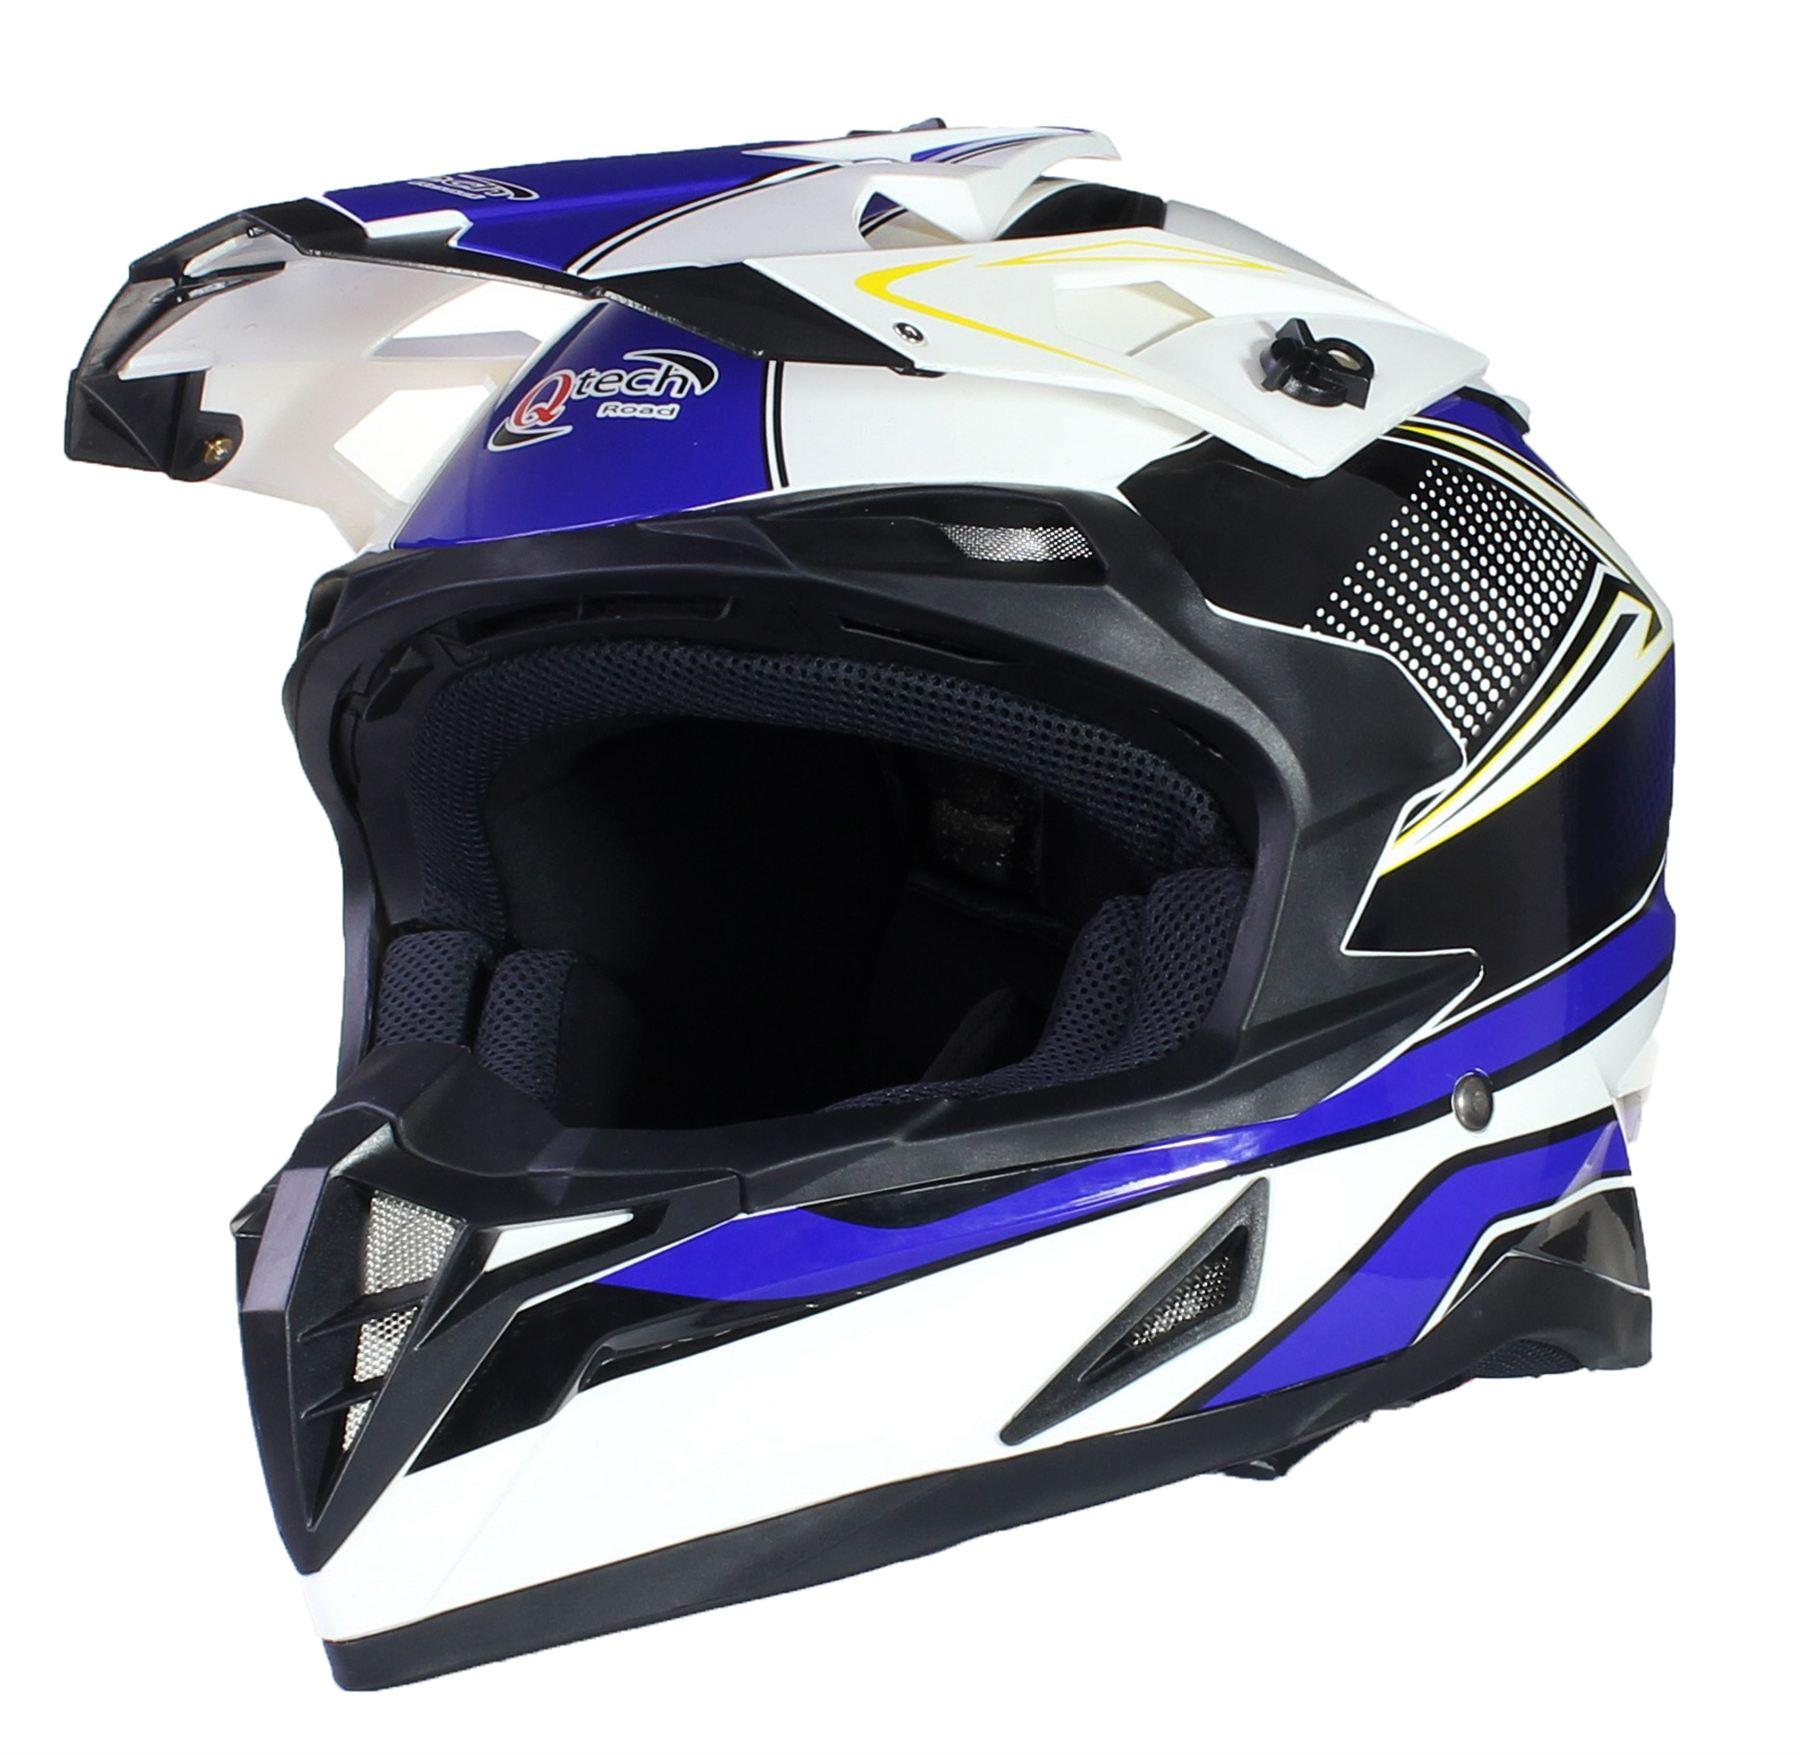 crosshelm off road motocross motorrad helm cross enduro. Black Bedroom Furniture Sets. Home Design Ideas